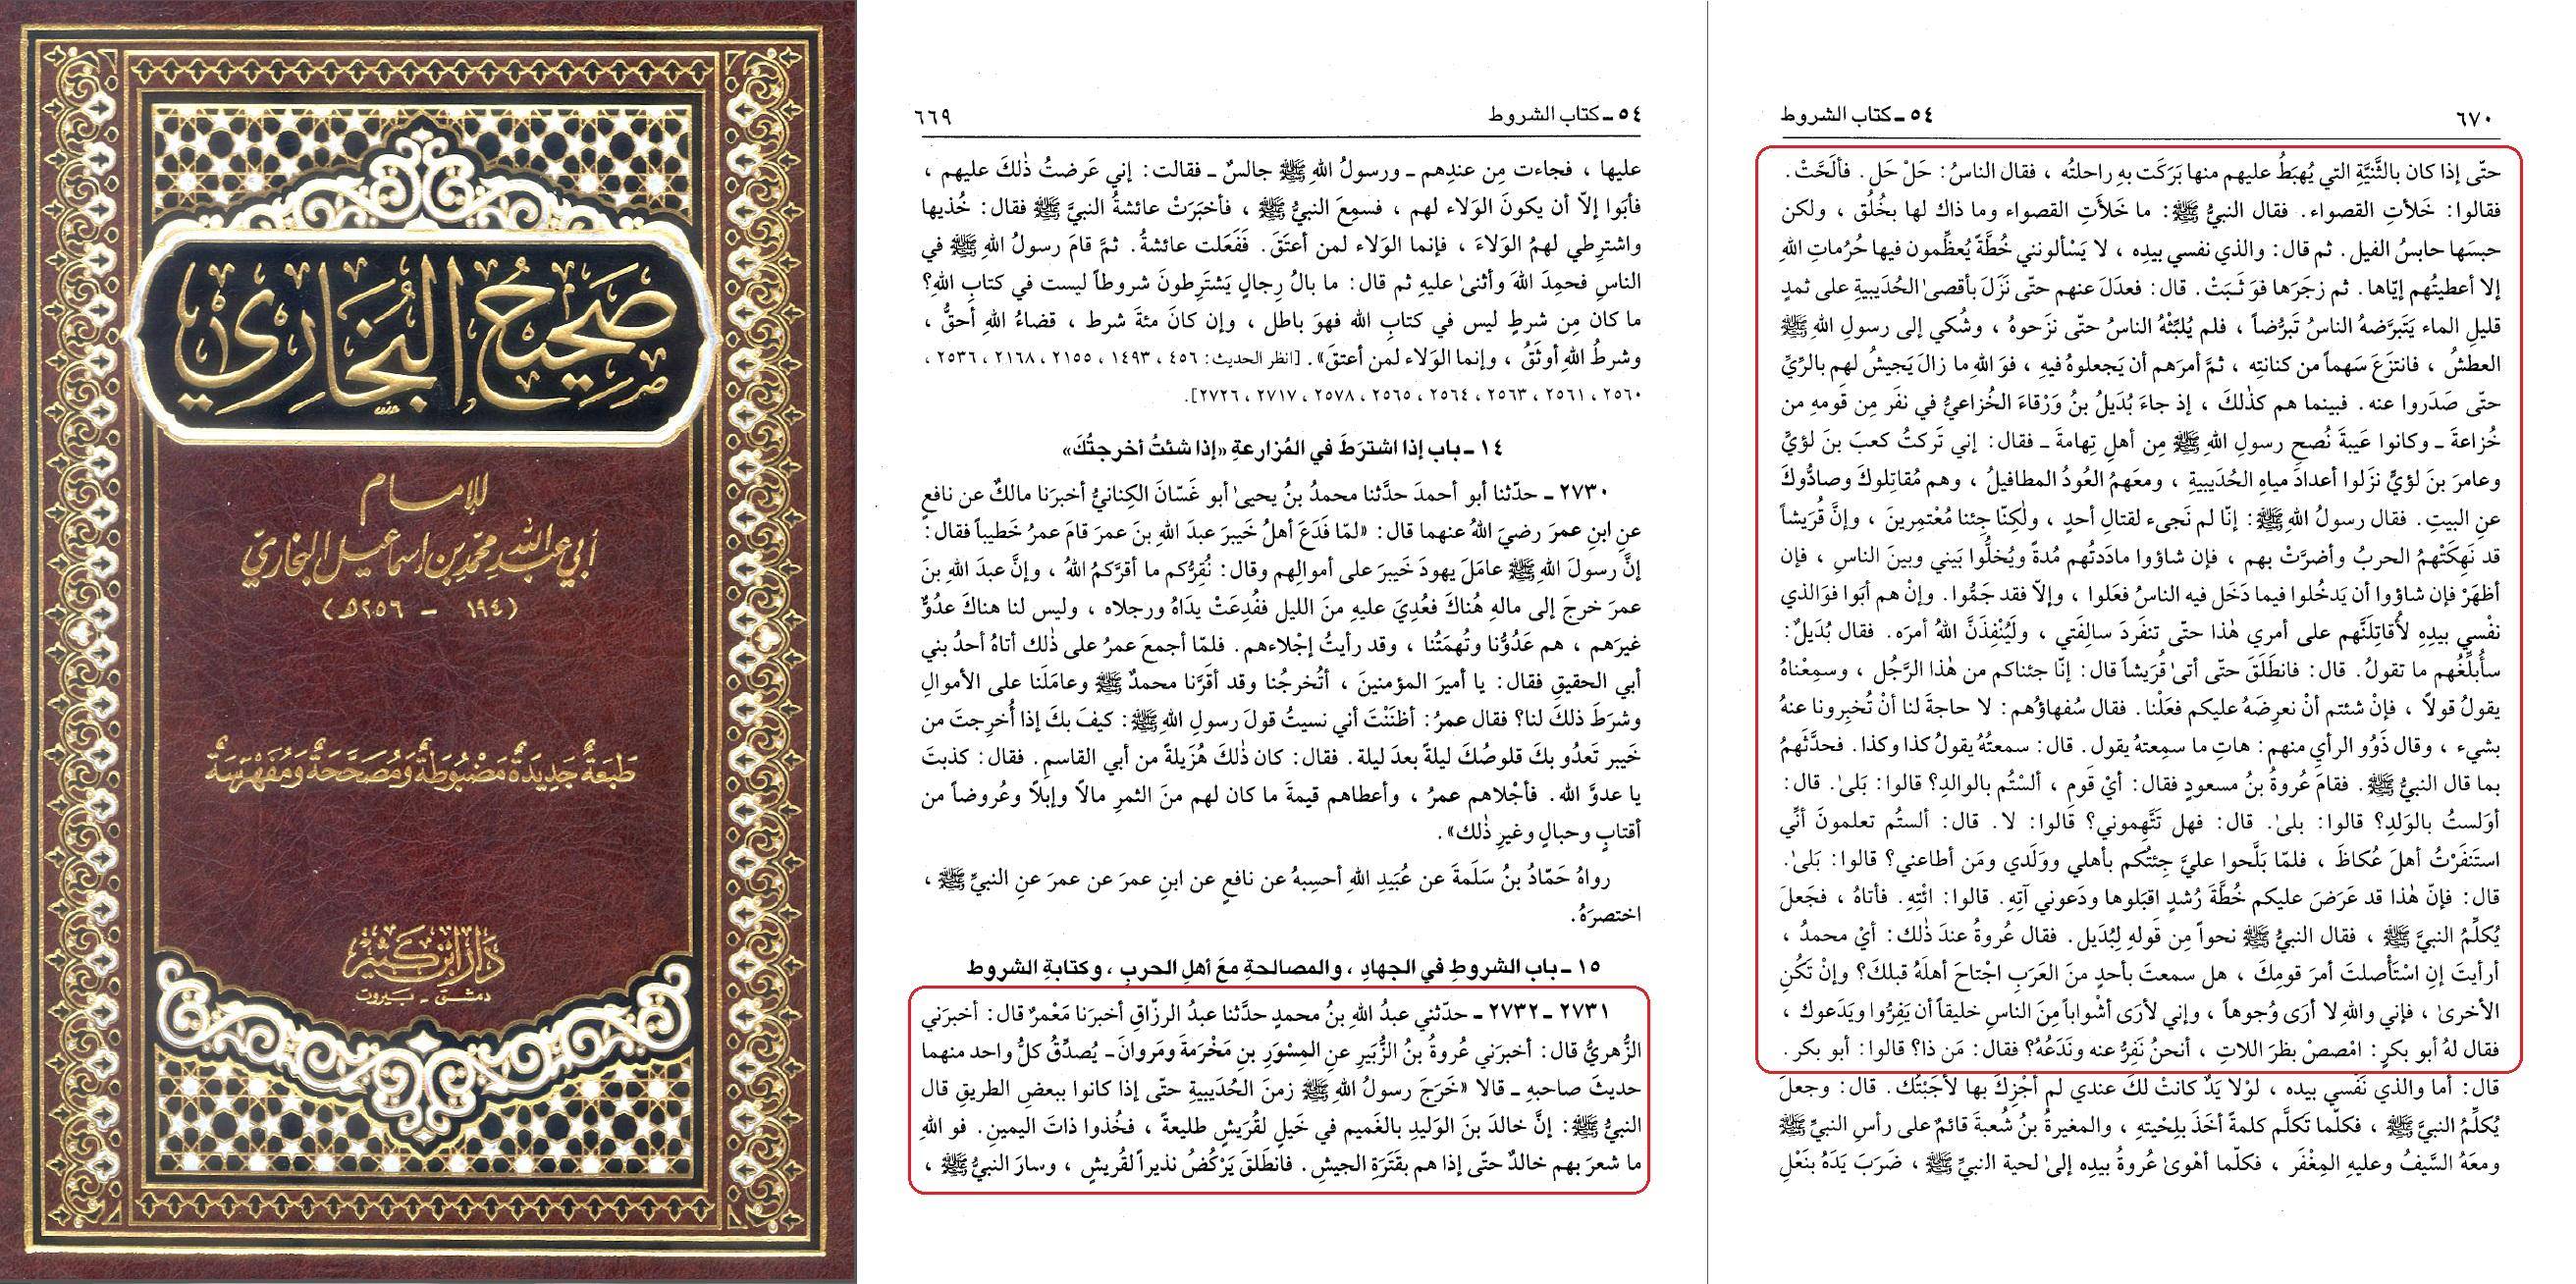 Sa7i7-e Bo5ari S 670 H 2731 K 15 ash Shorud fil Jehad